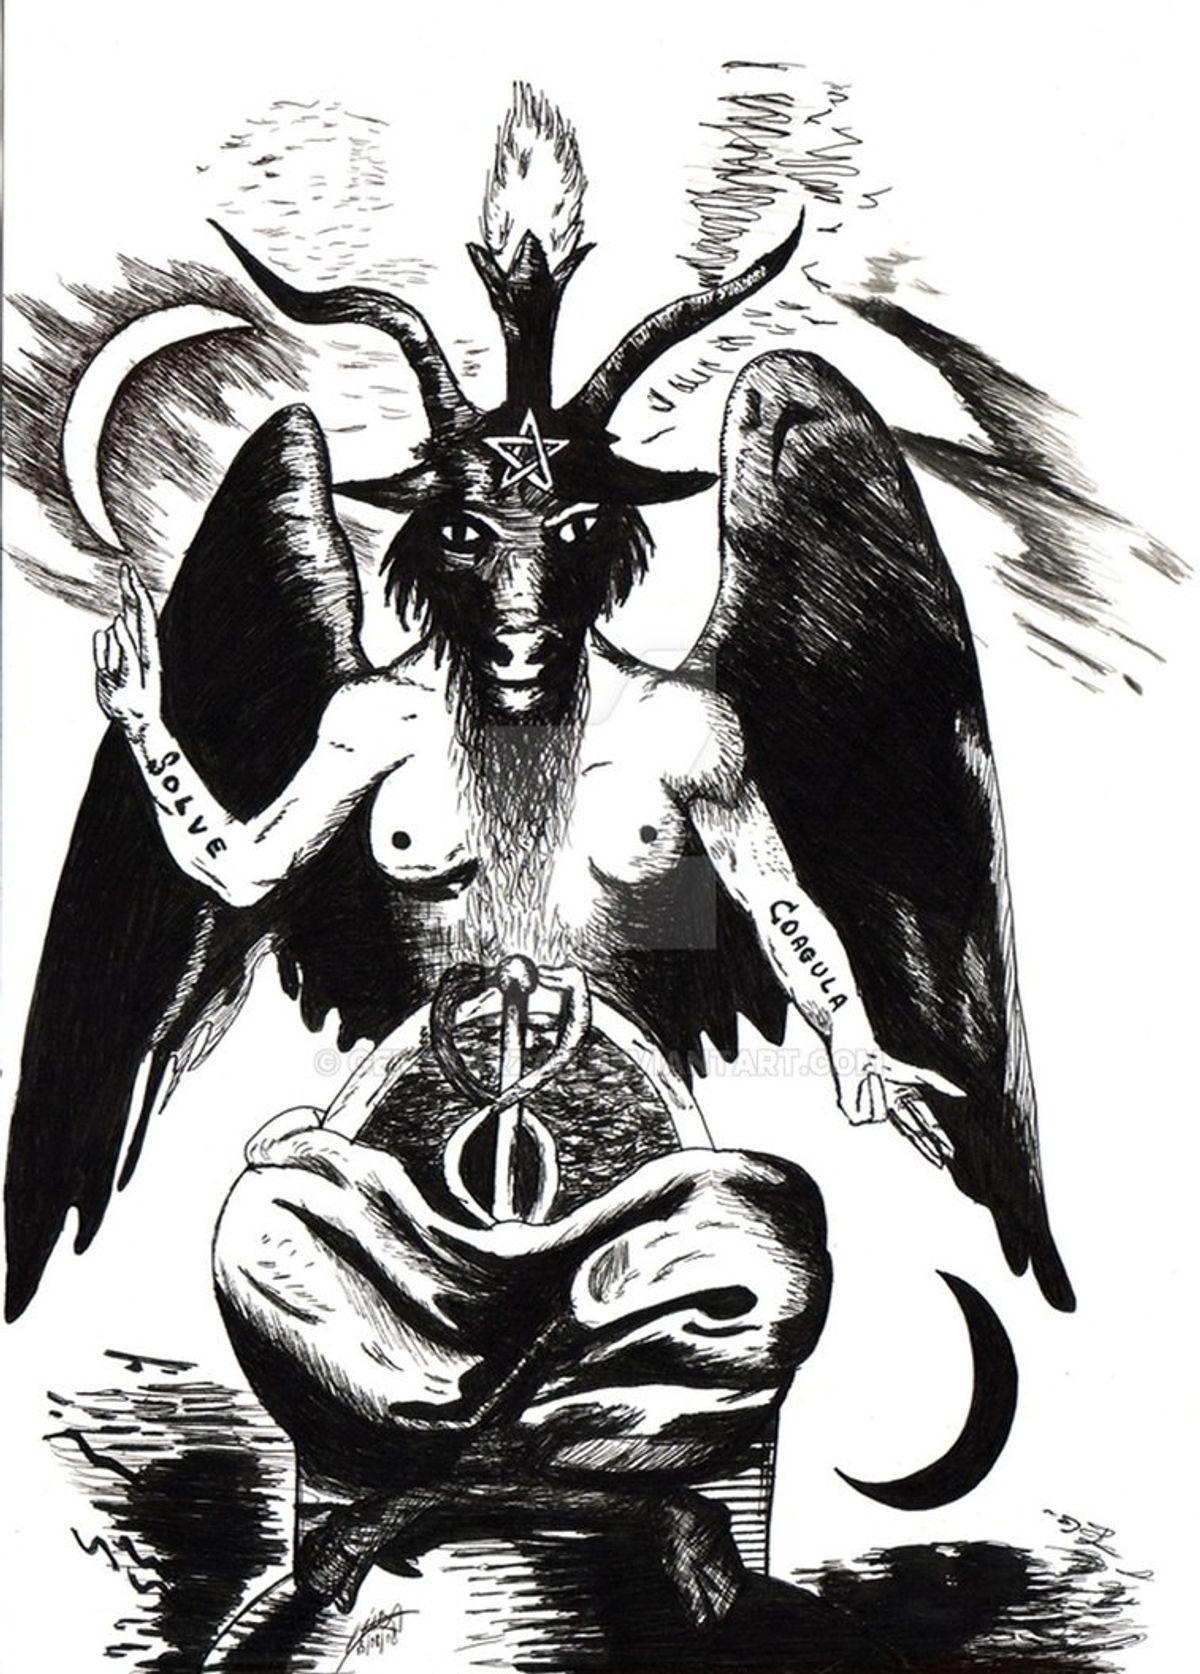 The 20th Century Mystics